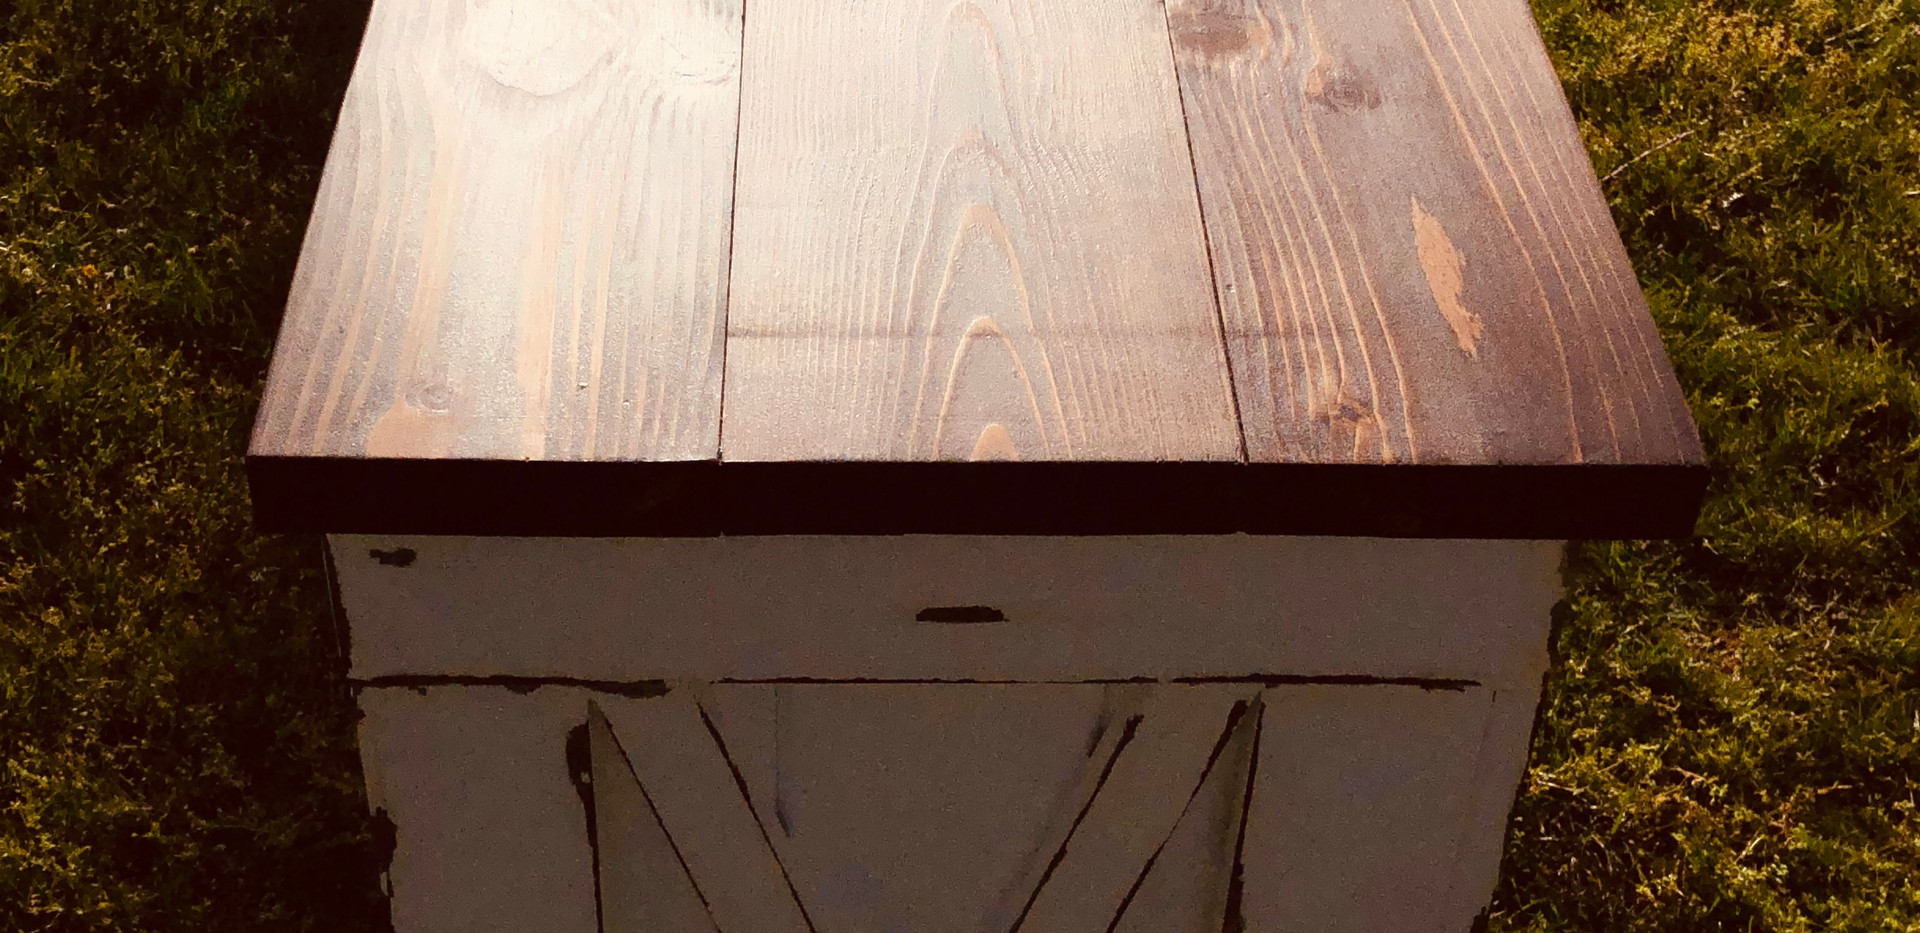 IMG_3Maro Farmhouse Console Paneling Distressed X830.jpeg